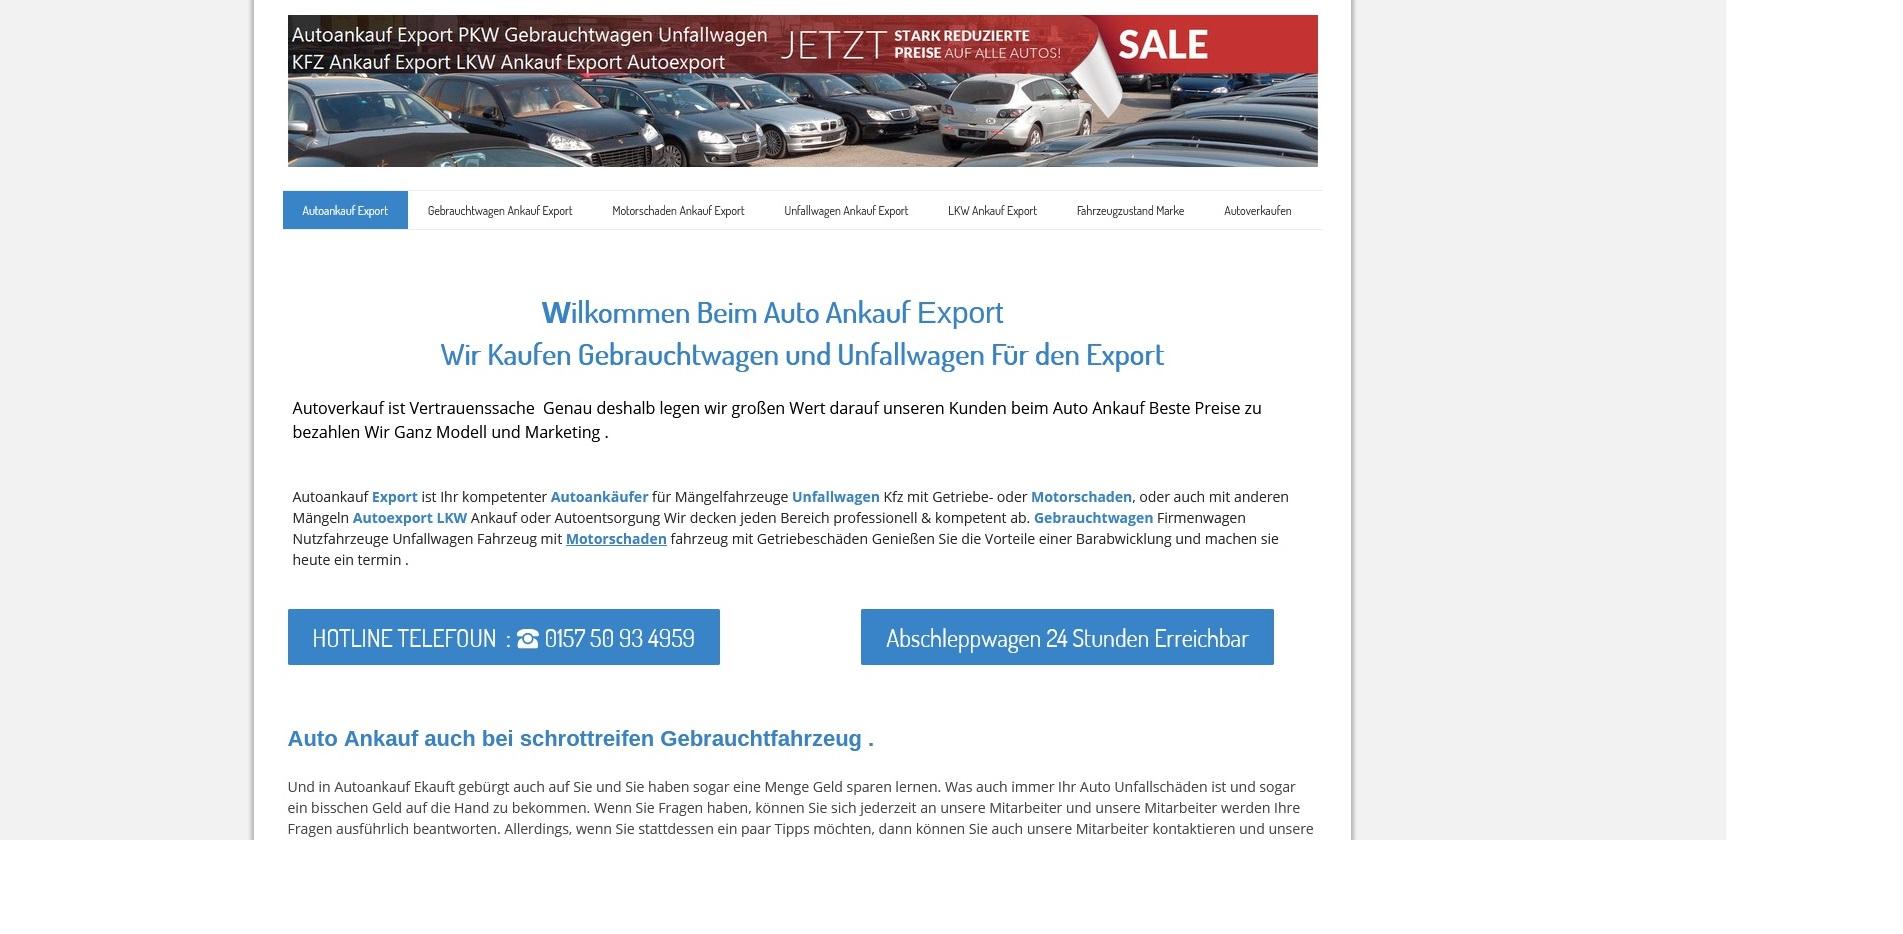 autoankauf heilbronn durch profi professionellen auto verkaufen - Autoankauf Heilbronn durch Profi professionellen Auto verkaufen